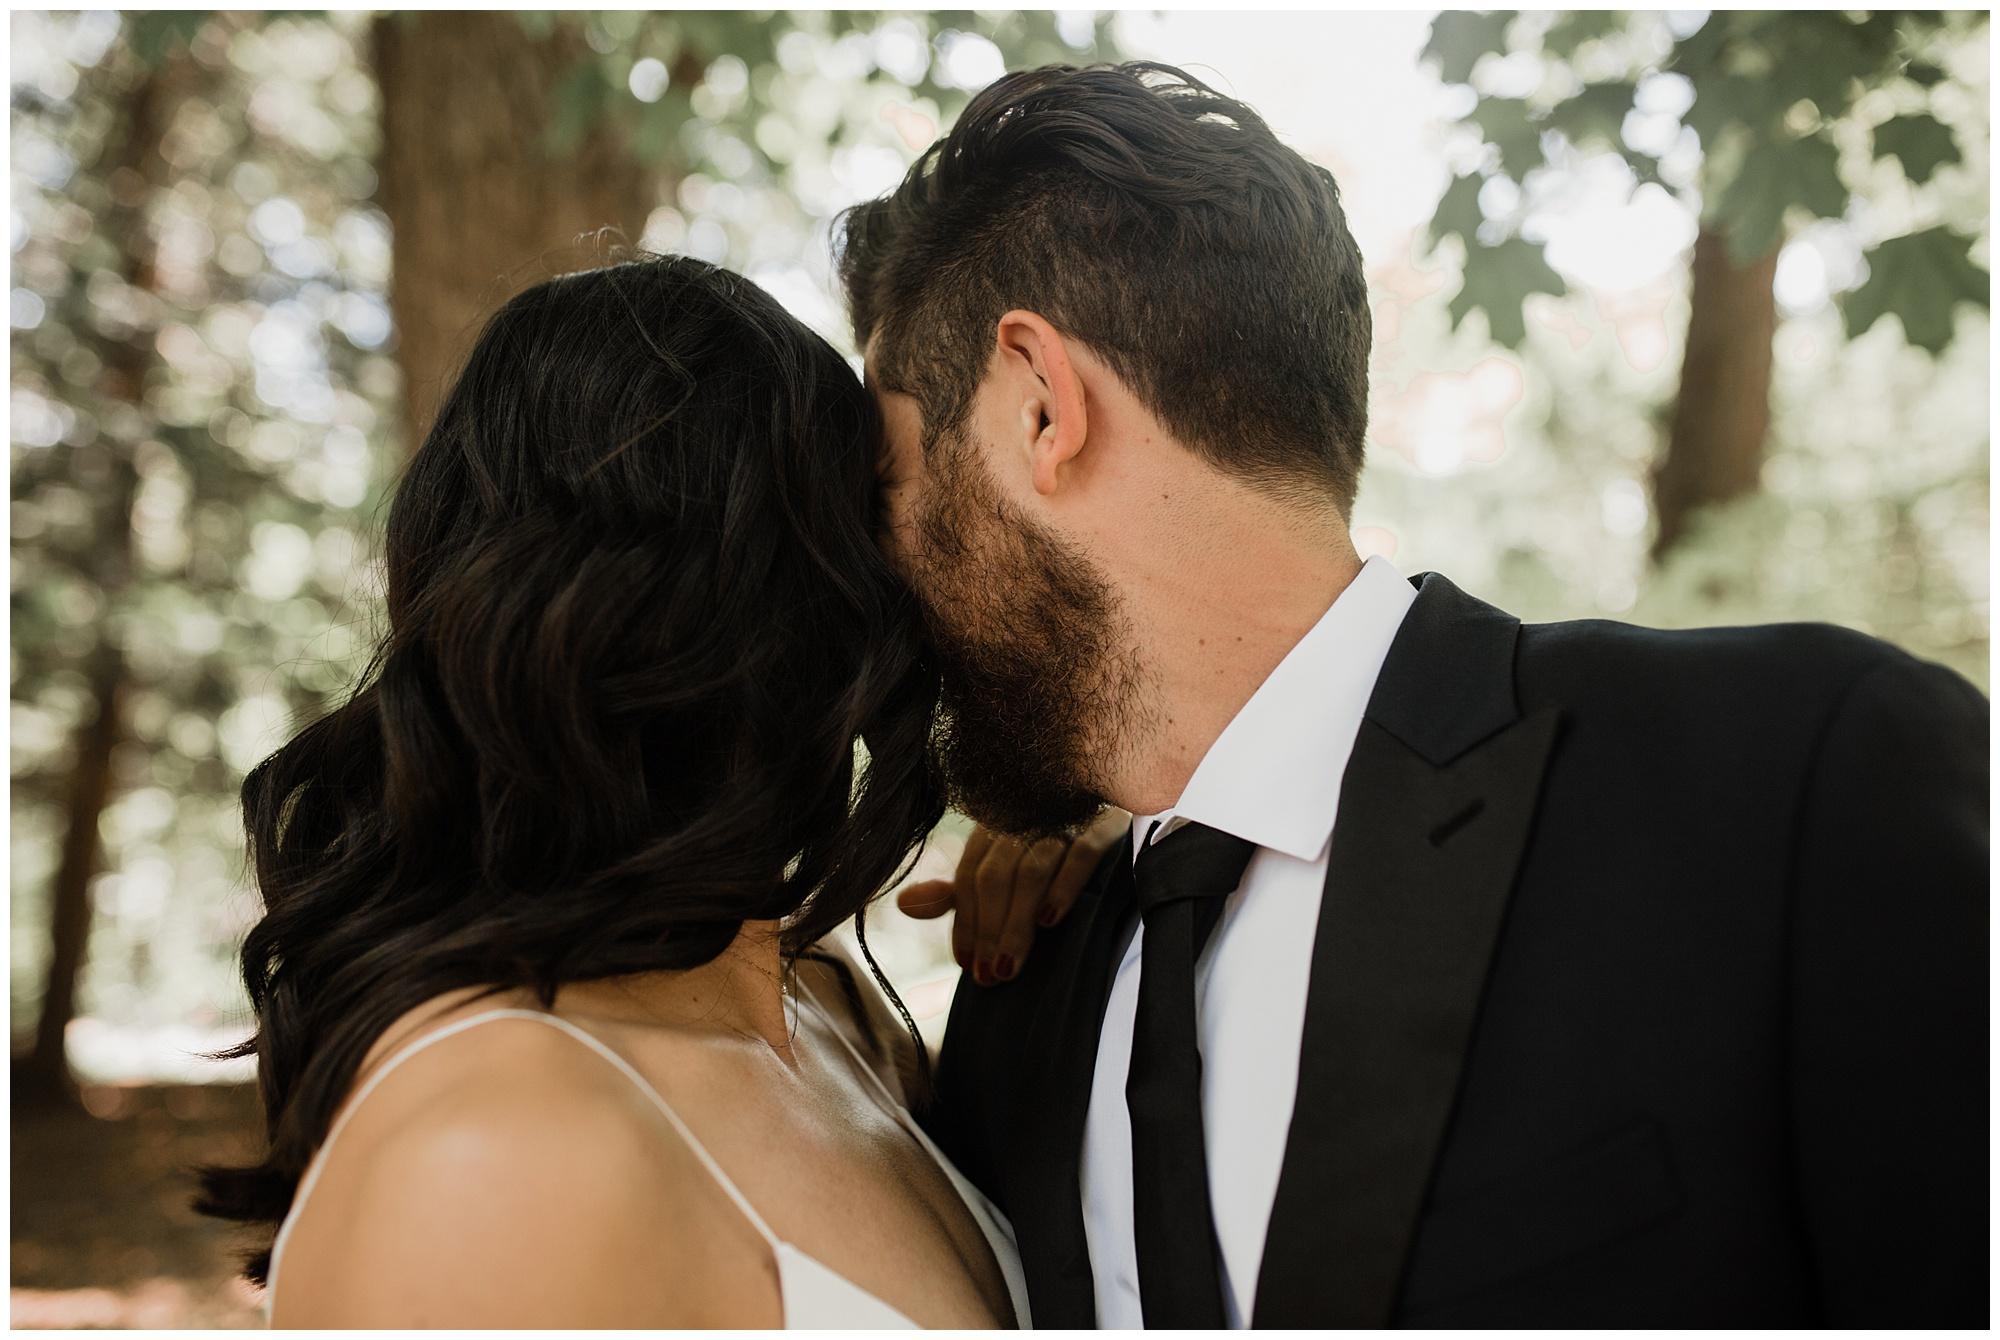 allerton_park_wedding_champaign_il_chicago_wright_photographs_ne_0055.jpg